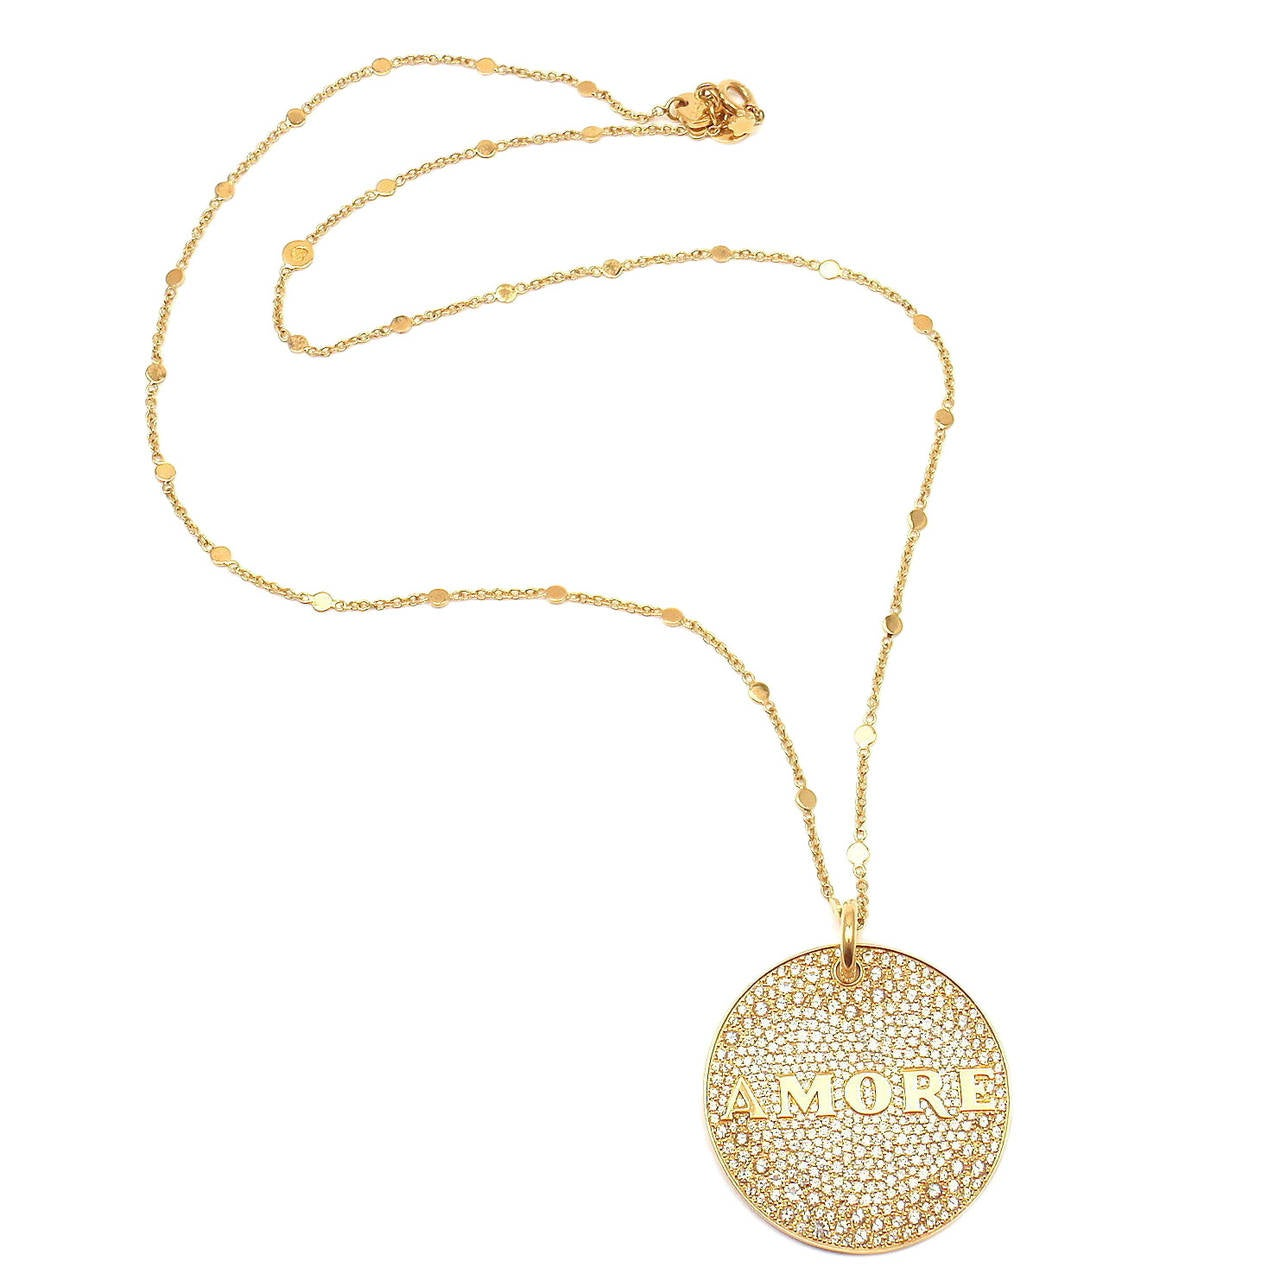 Pasquale Bruni Profondo Amore Gold Pendant Necklace